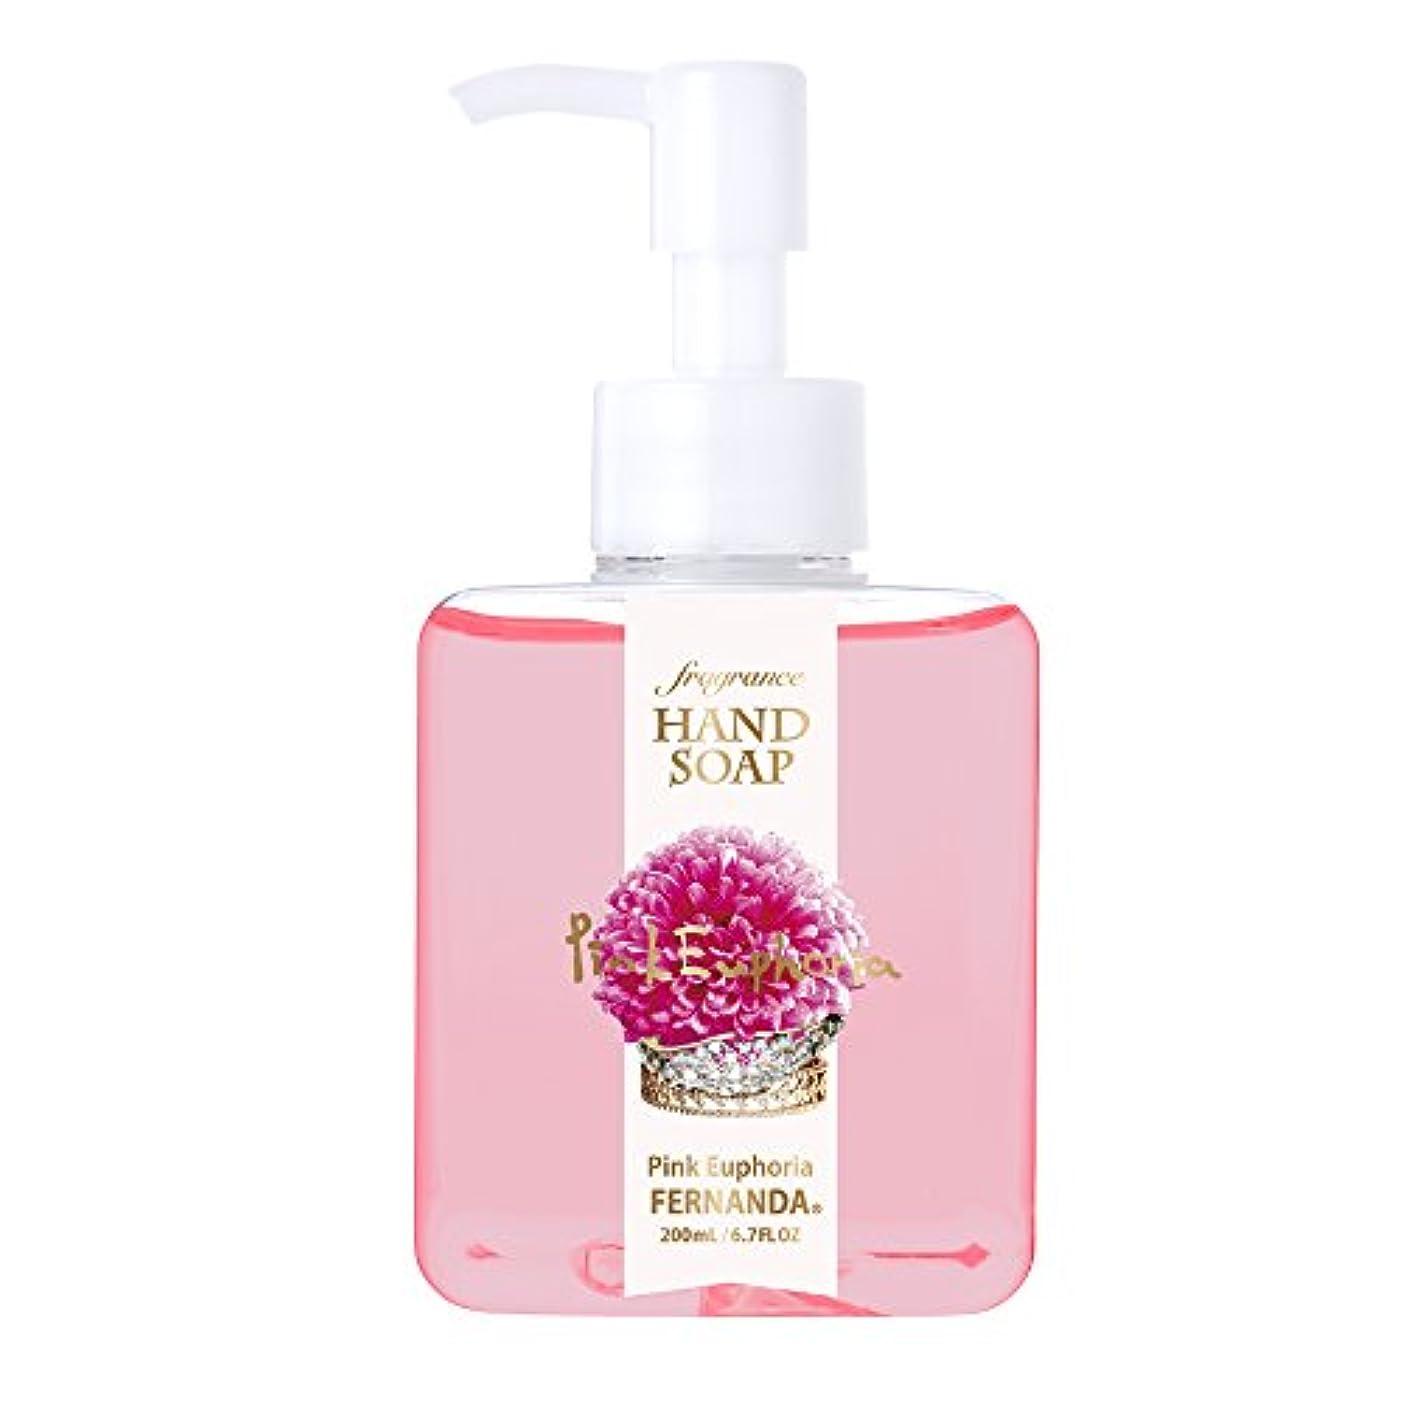 FERNANDA(フェルナンダ) Fragrance Hand Soap Pink Euphoria (ハンドソープ ピンクエウフォリア)